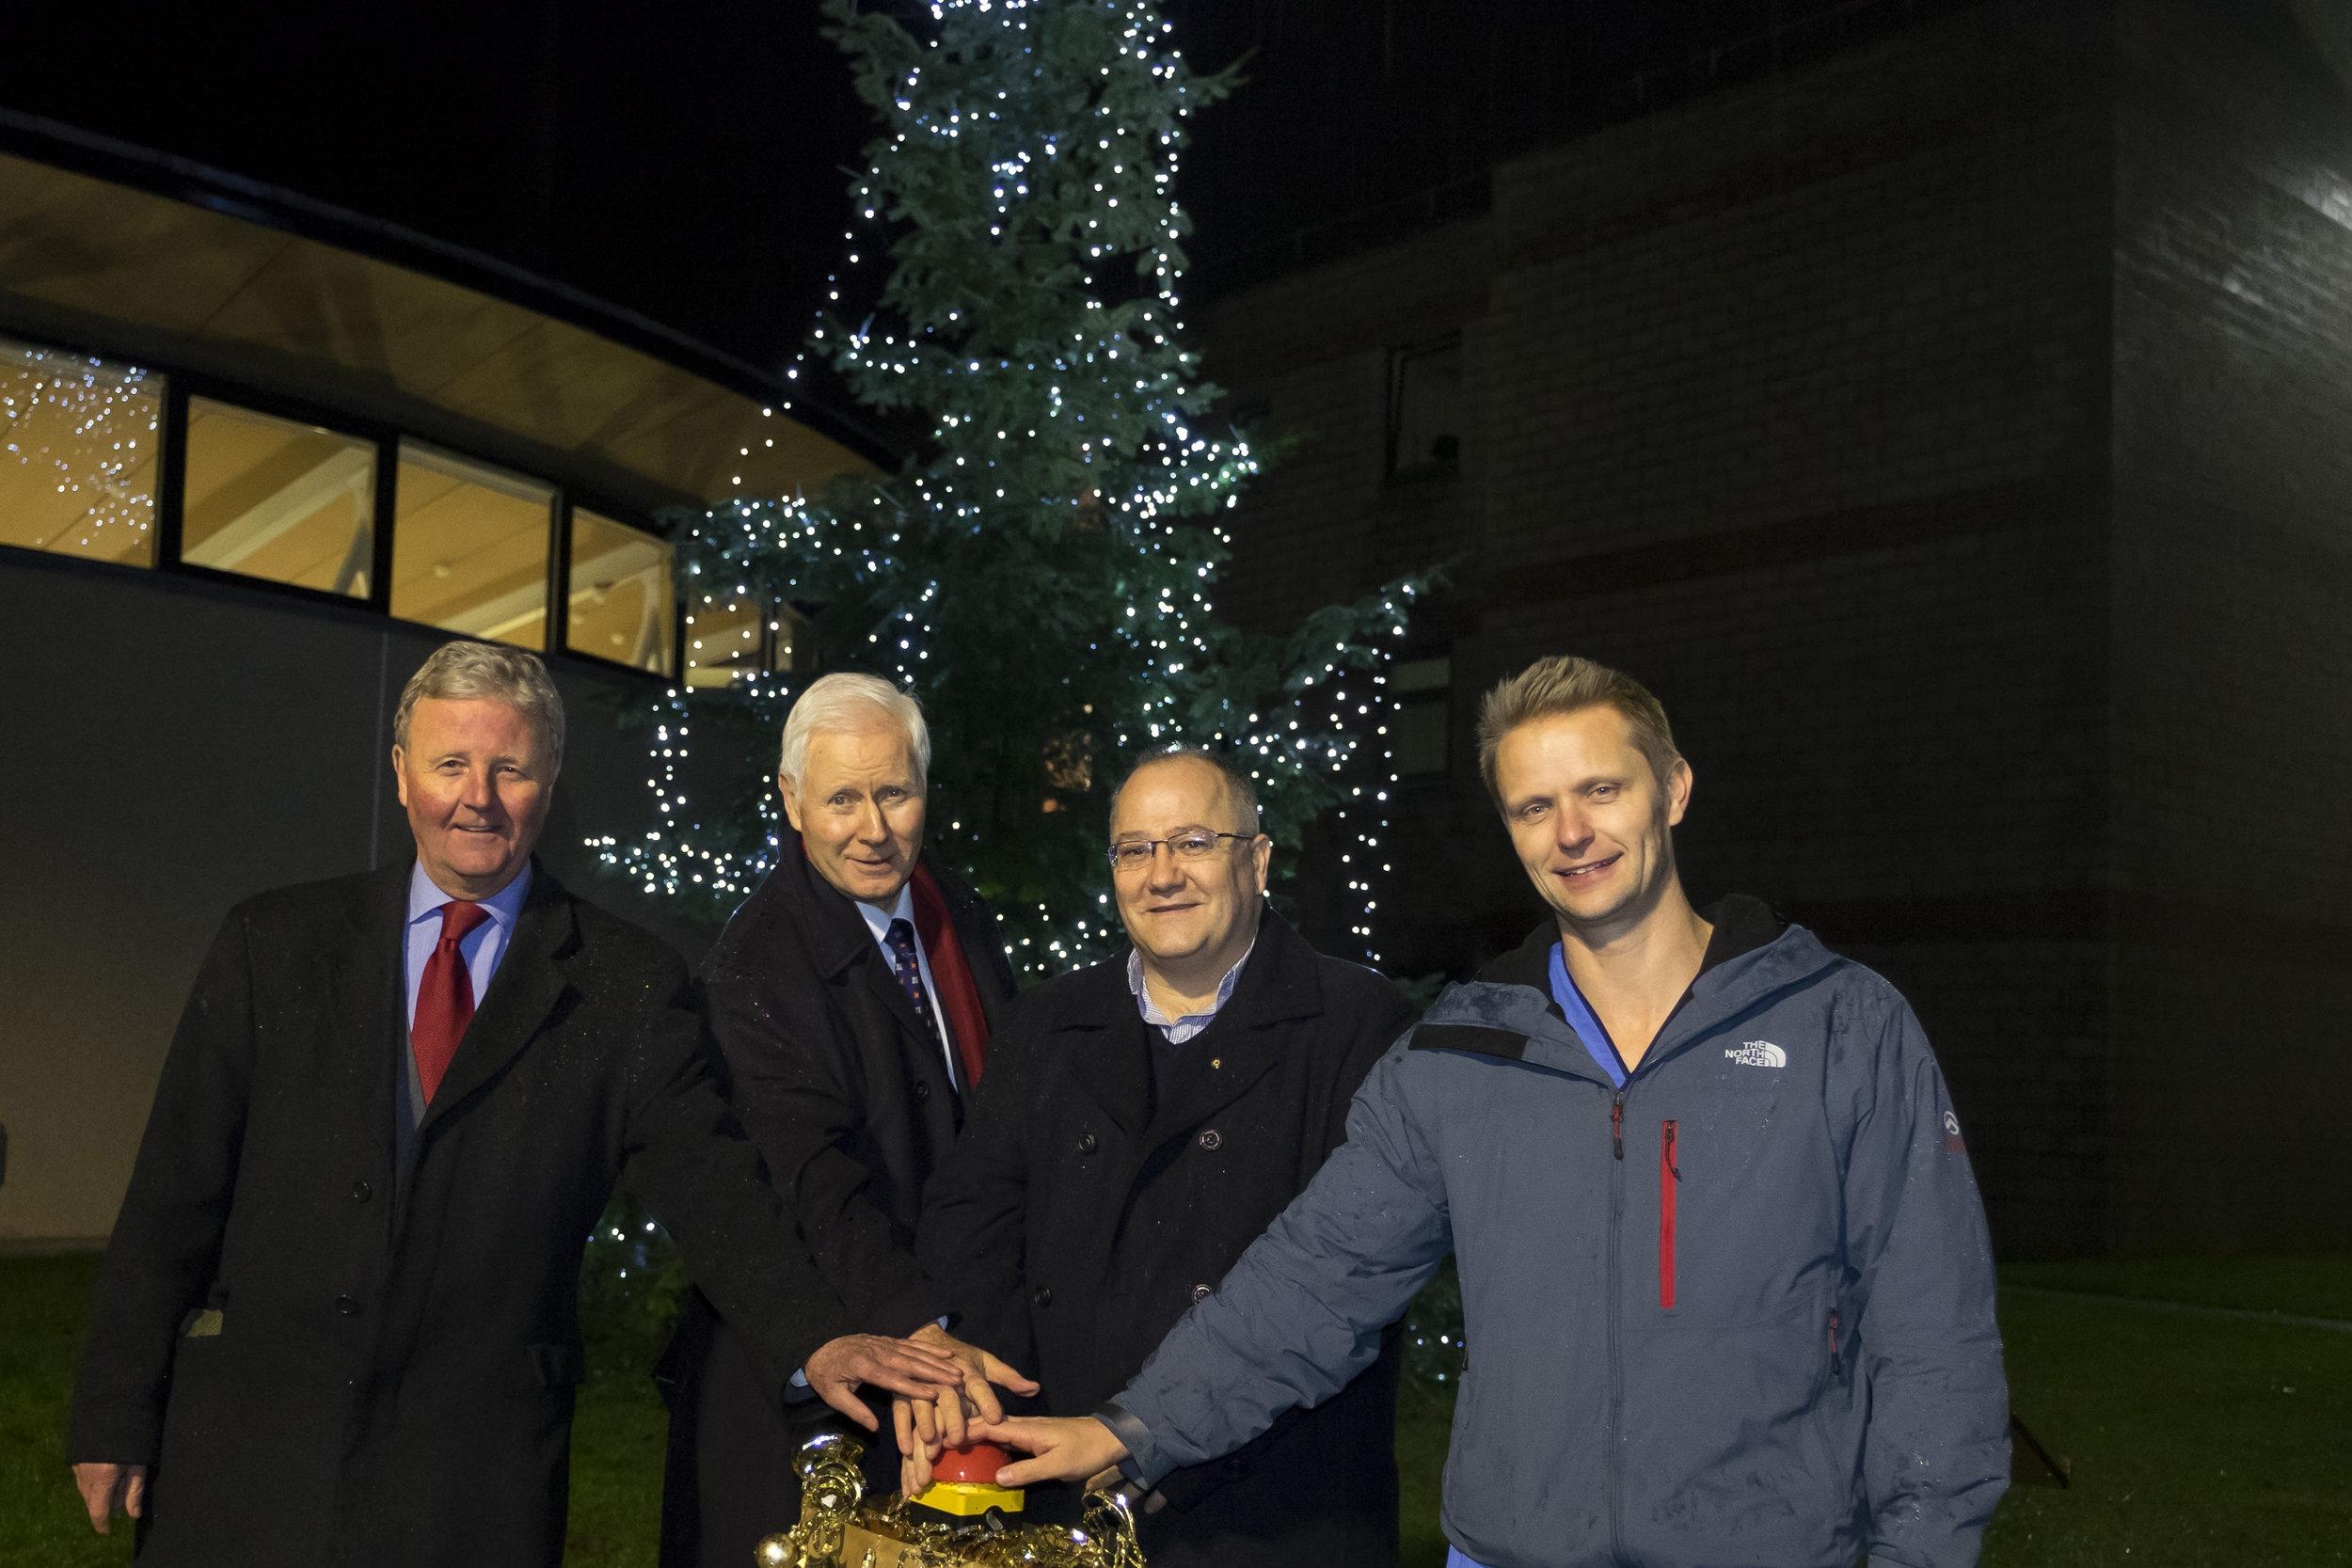 L to R: James Marjoribanks (The Difference), John Raine (Chairman, NHS Borders), James Torrie & Richard Turnbull (Huntlyburn Ward)